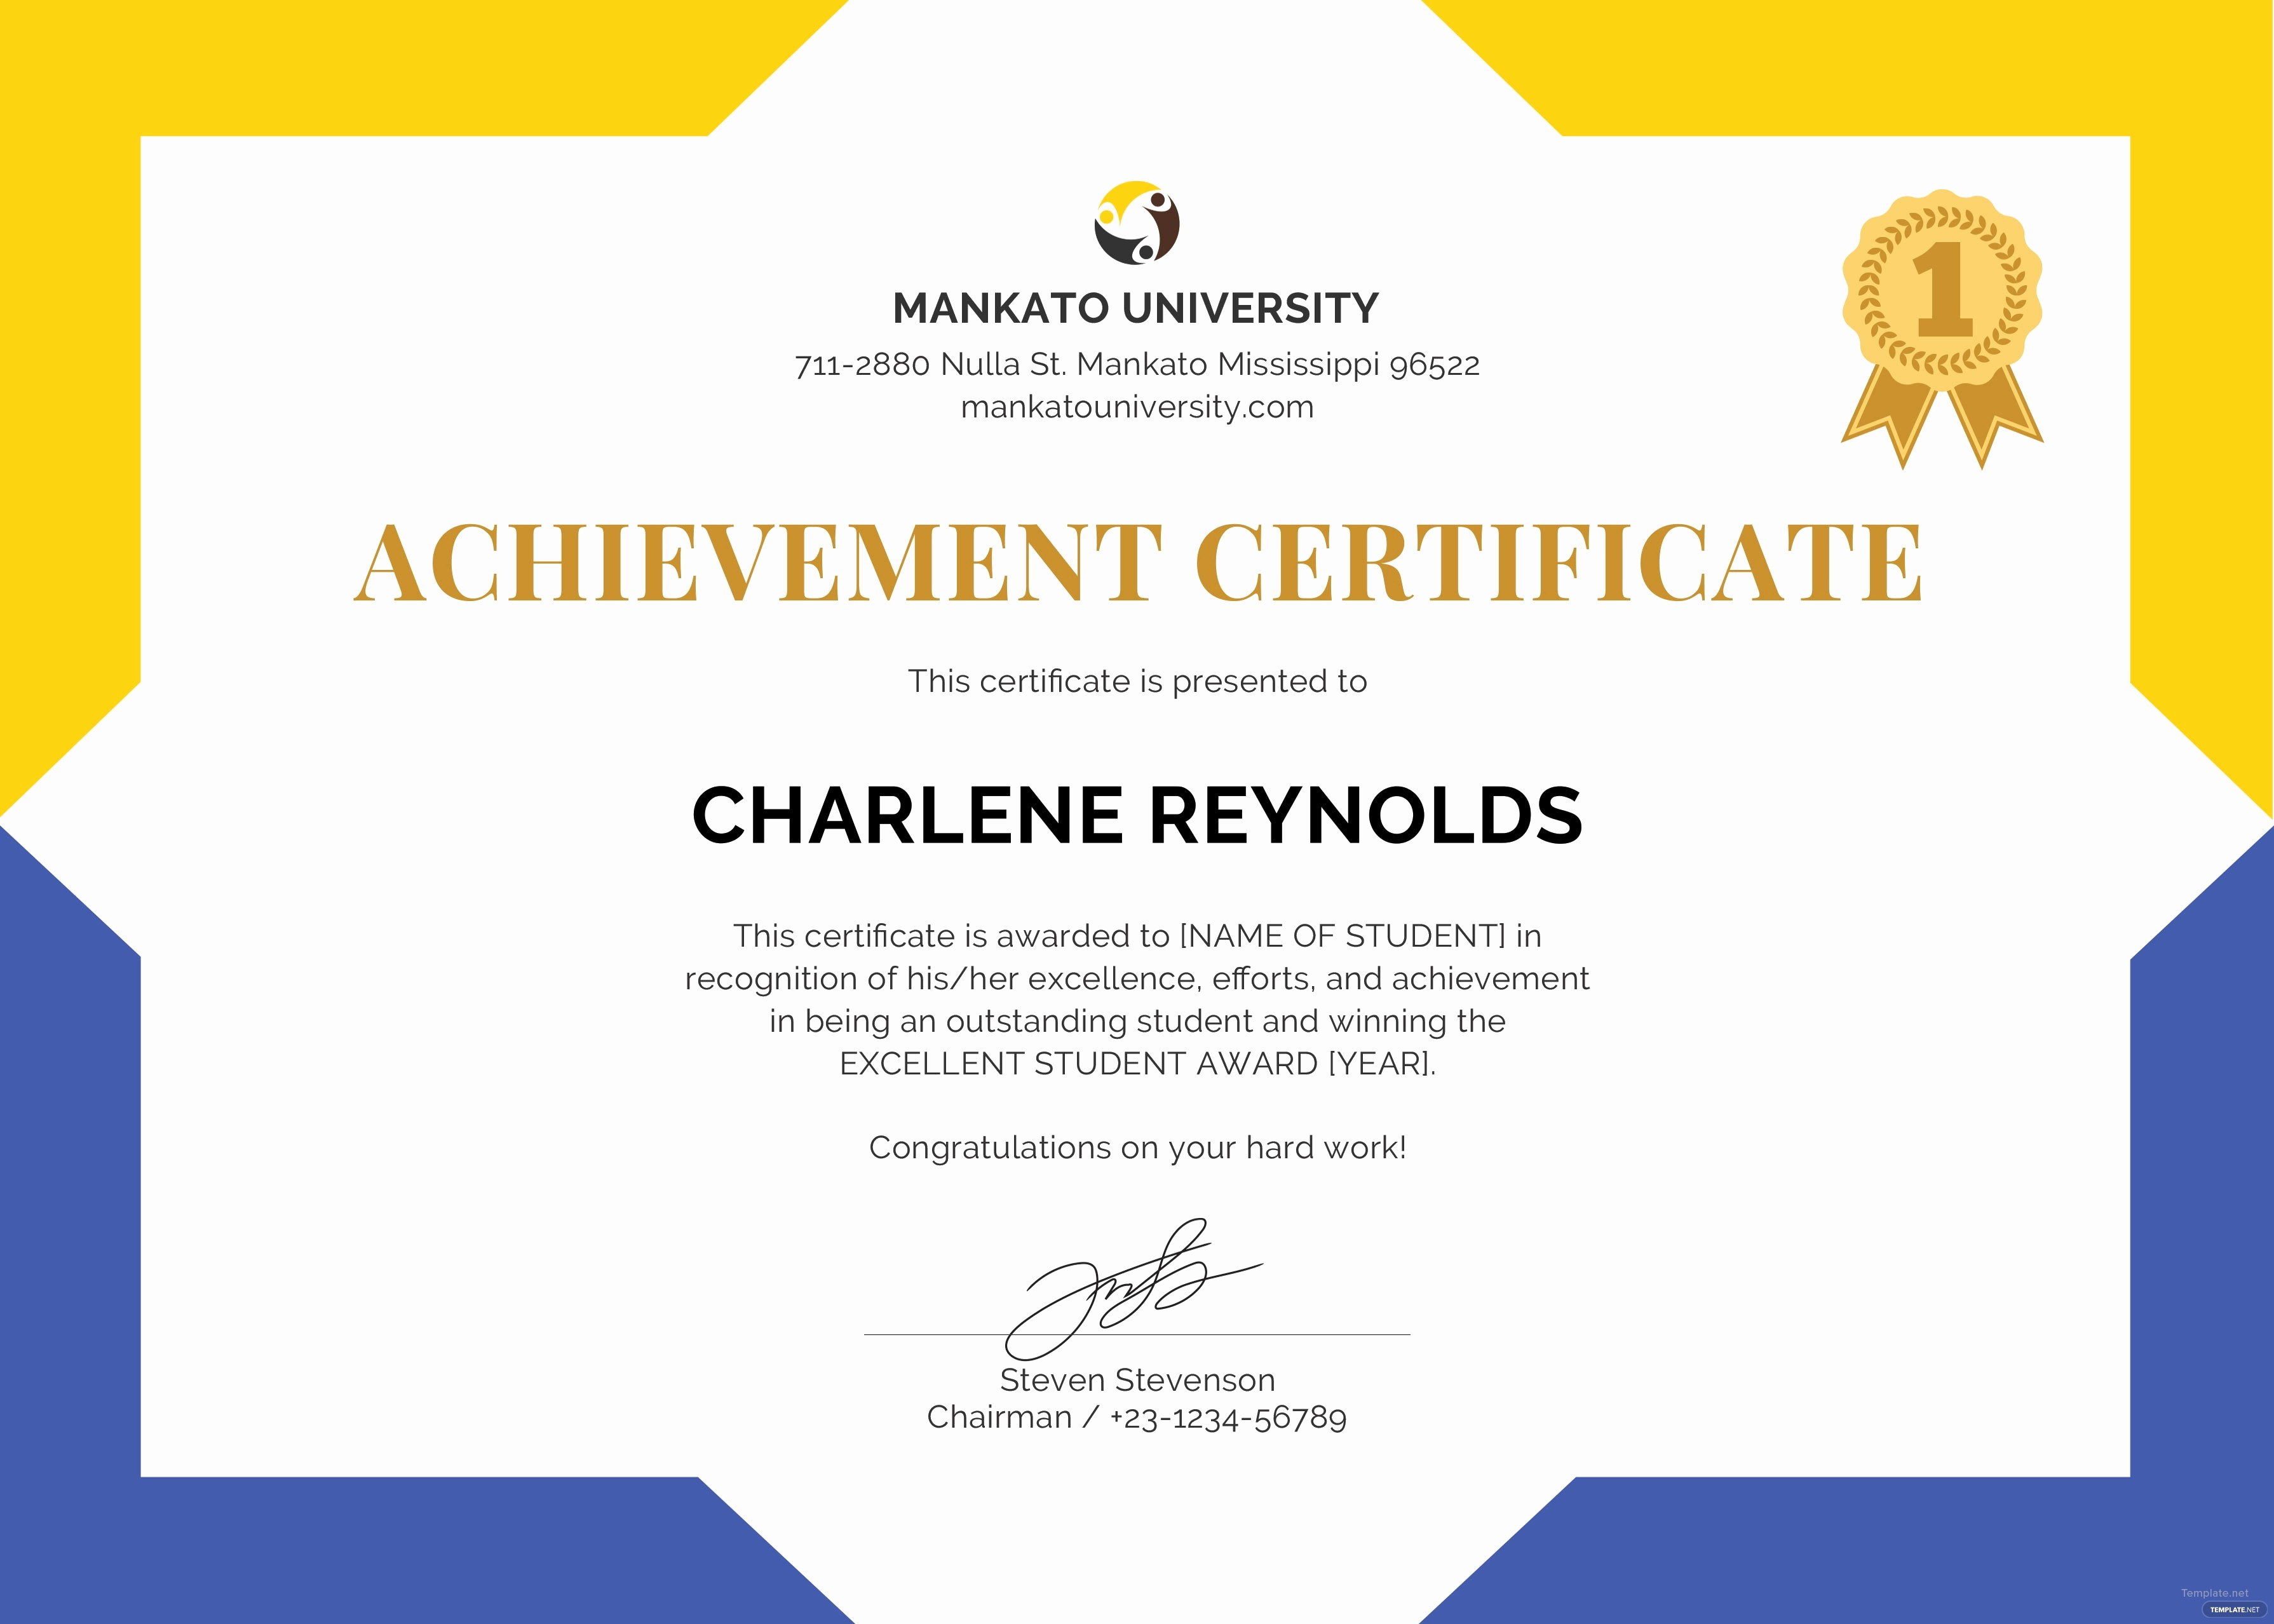 Microsoft Publisher Award Certificate Templates Elegant Free School Certificate Template In Microsoft Word